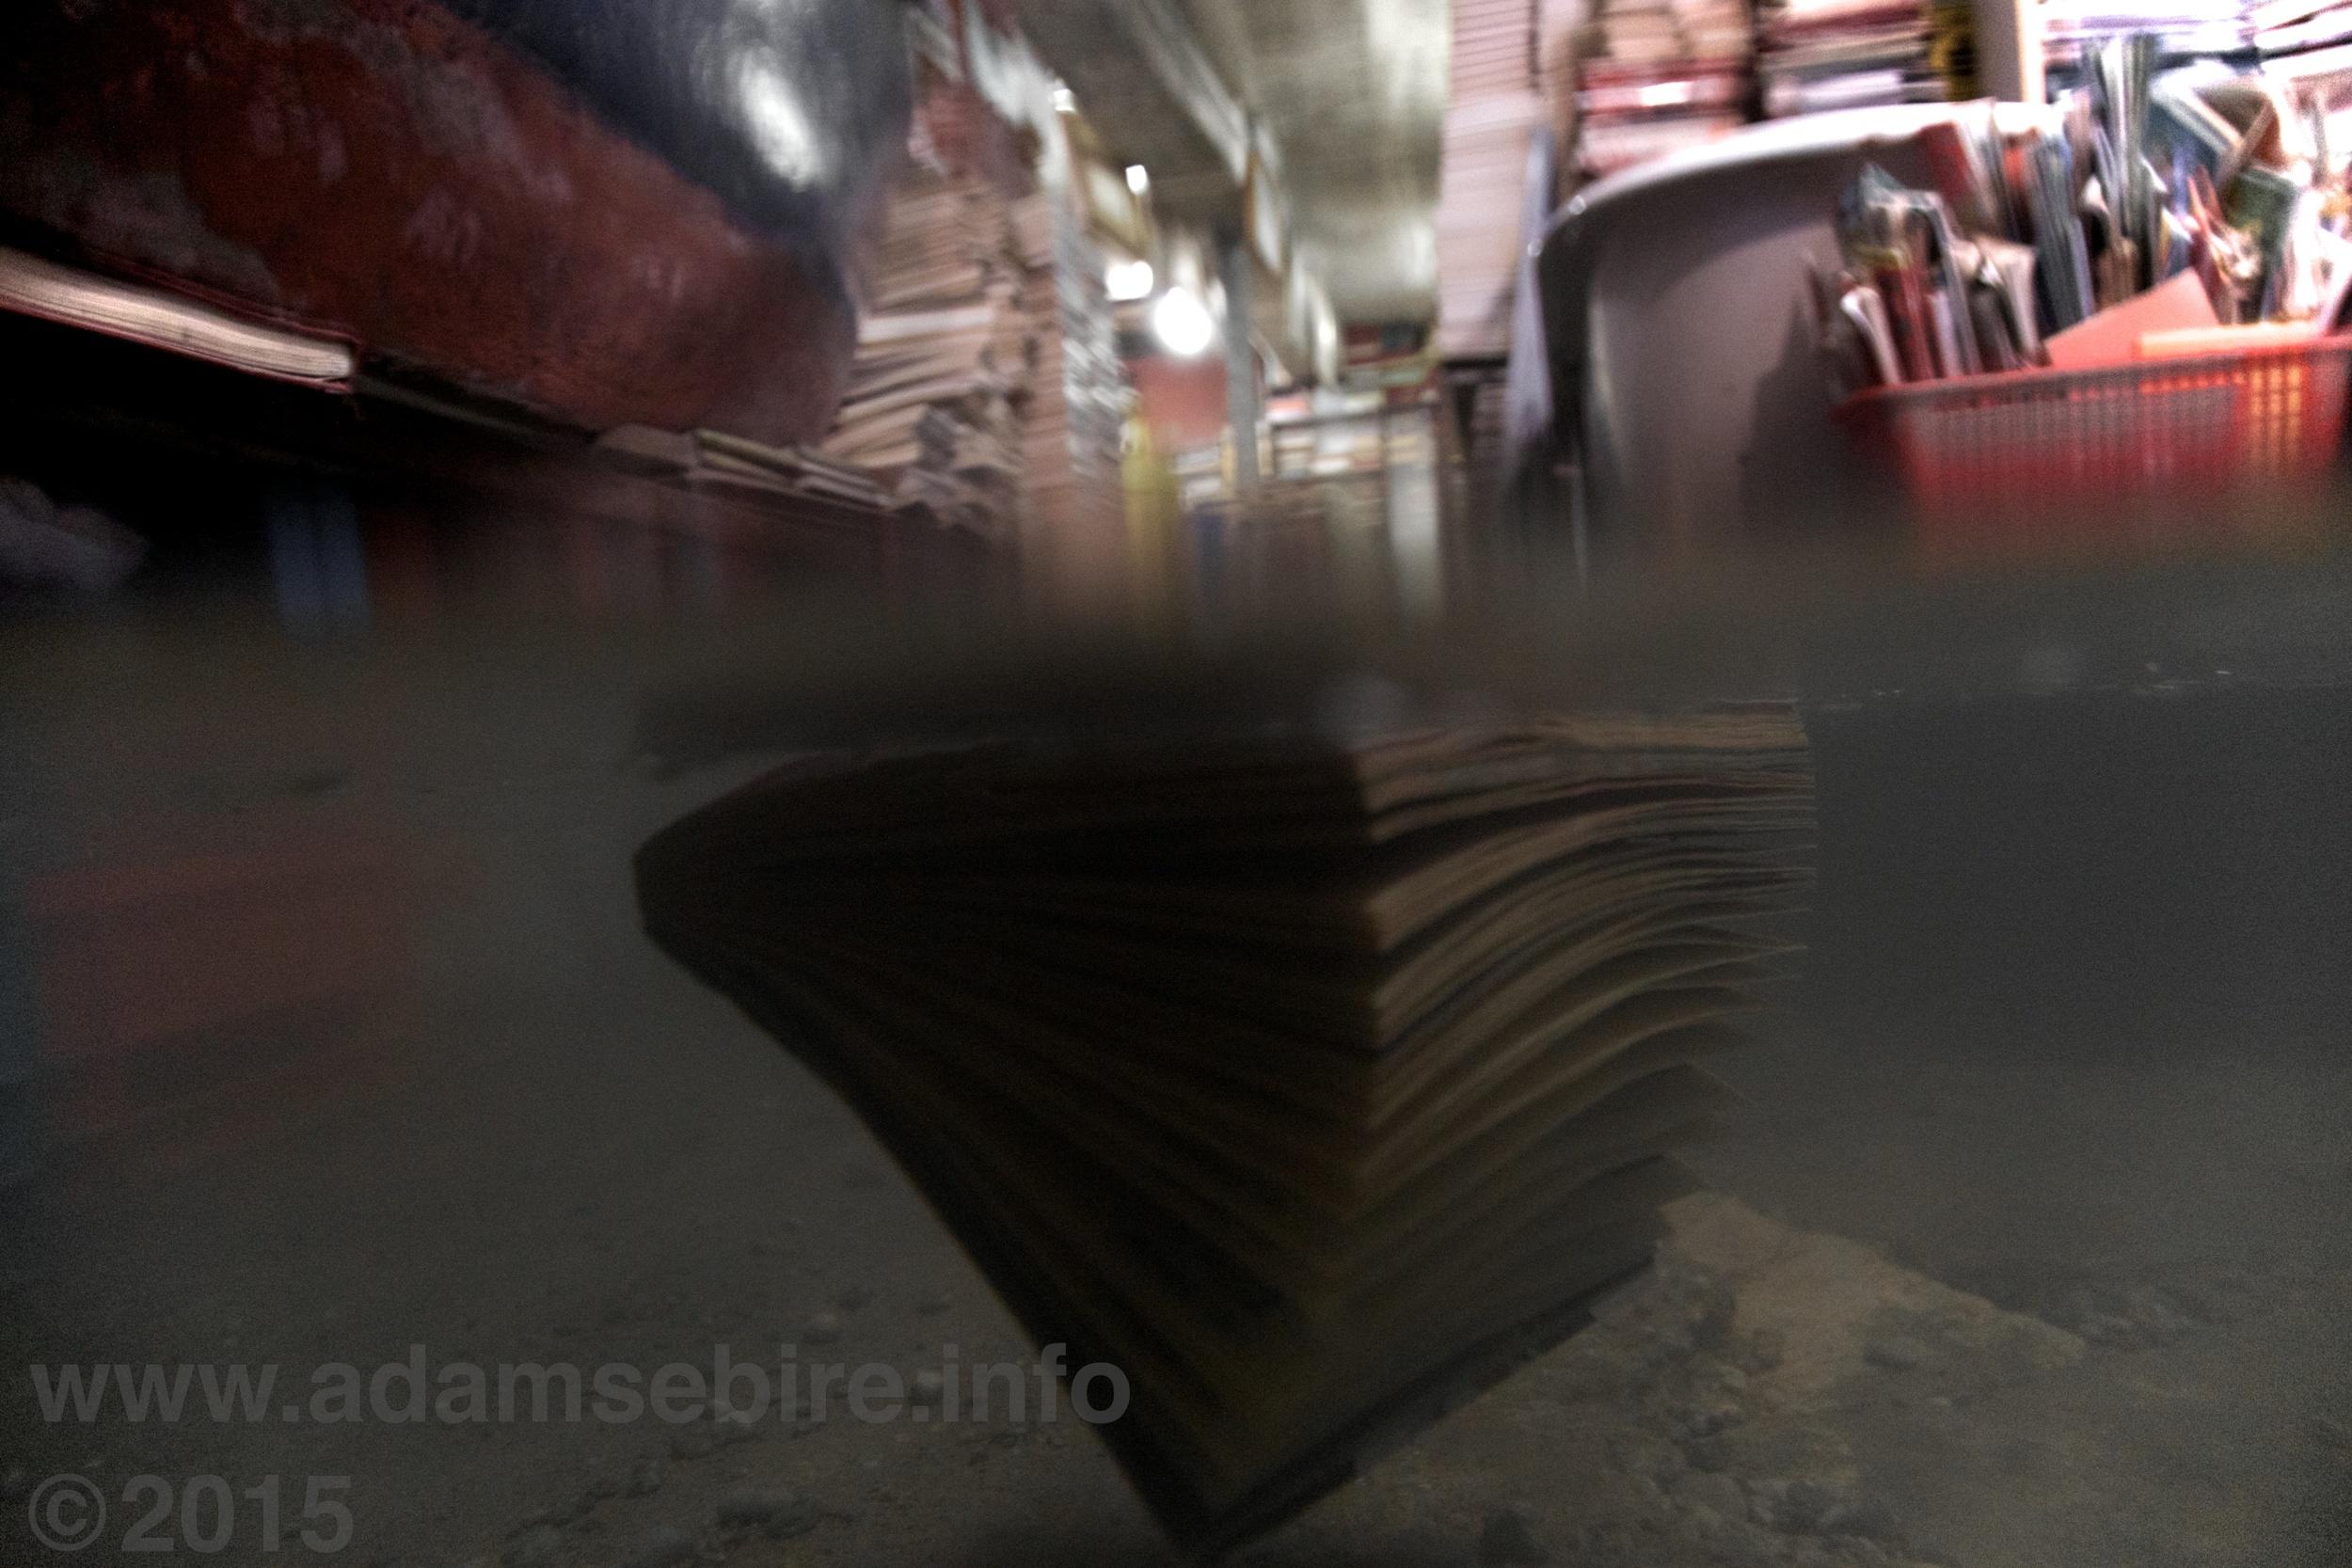 Venice acqua alta bookshop underwater during high tide flooding